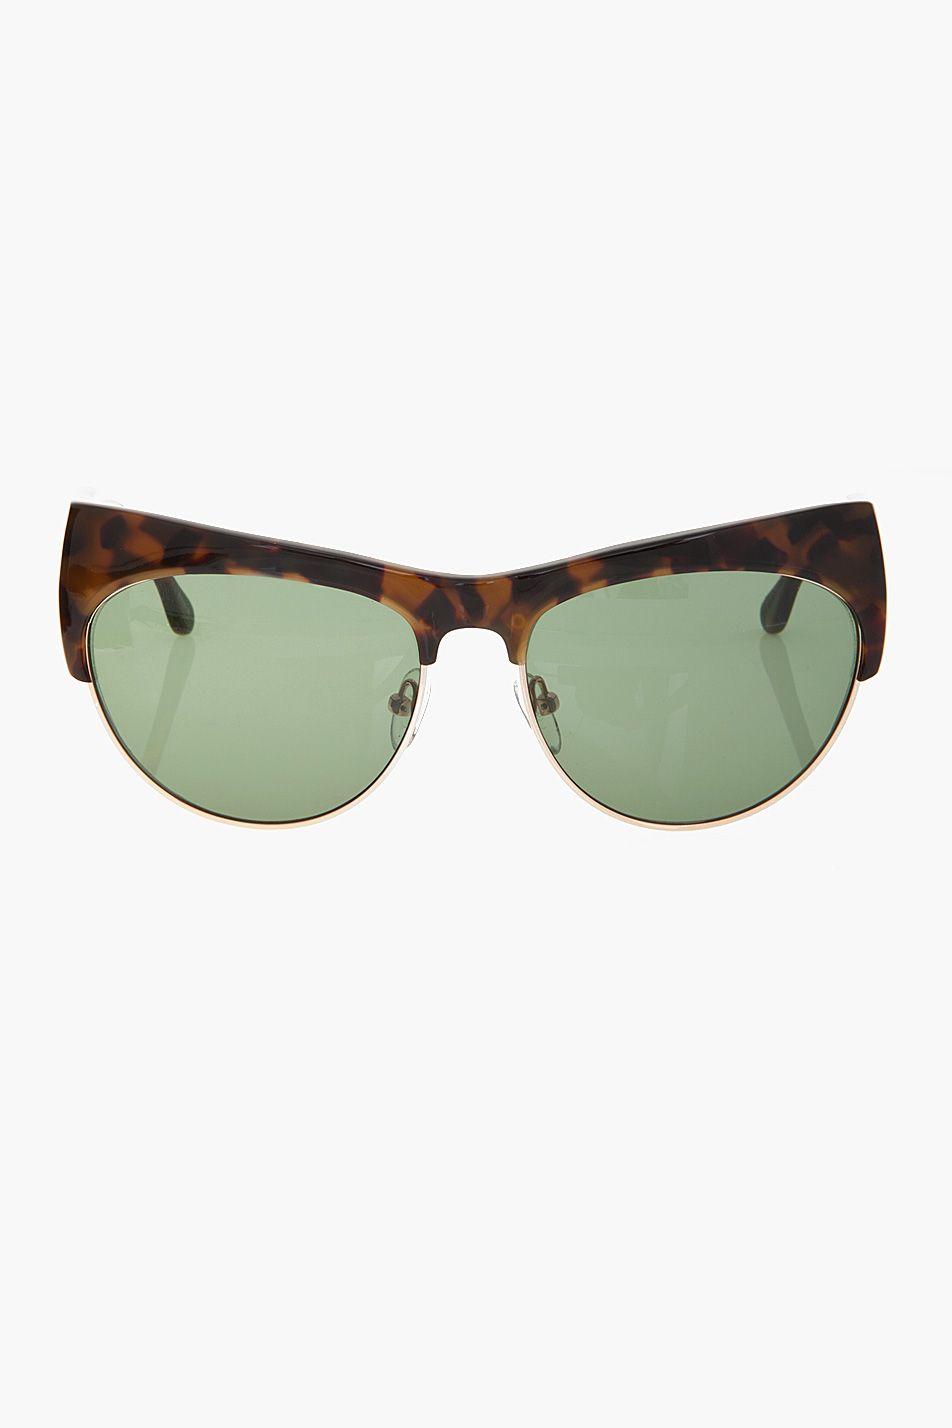 Black Technologic Sunglasses | Gafas de sol oakley, Gafas y Oakley